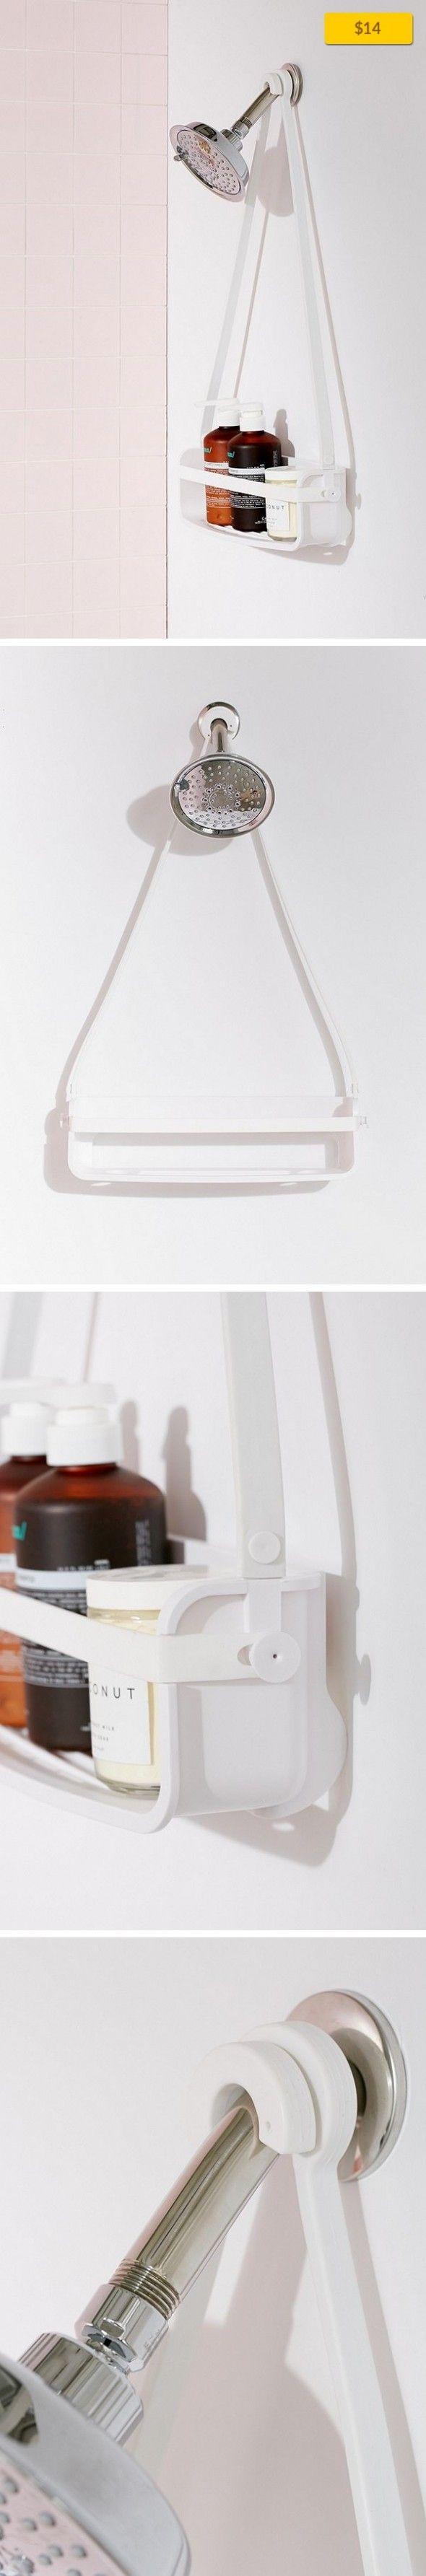 Flex Shelf Shower Caddy Sale, Apartment Sale, Bath Designed to take ...